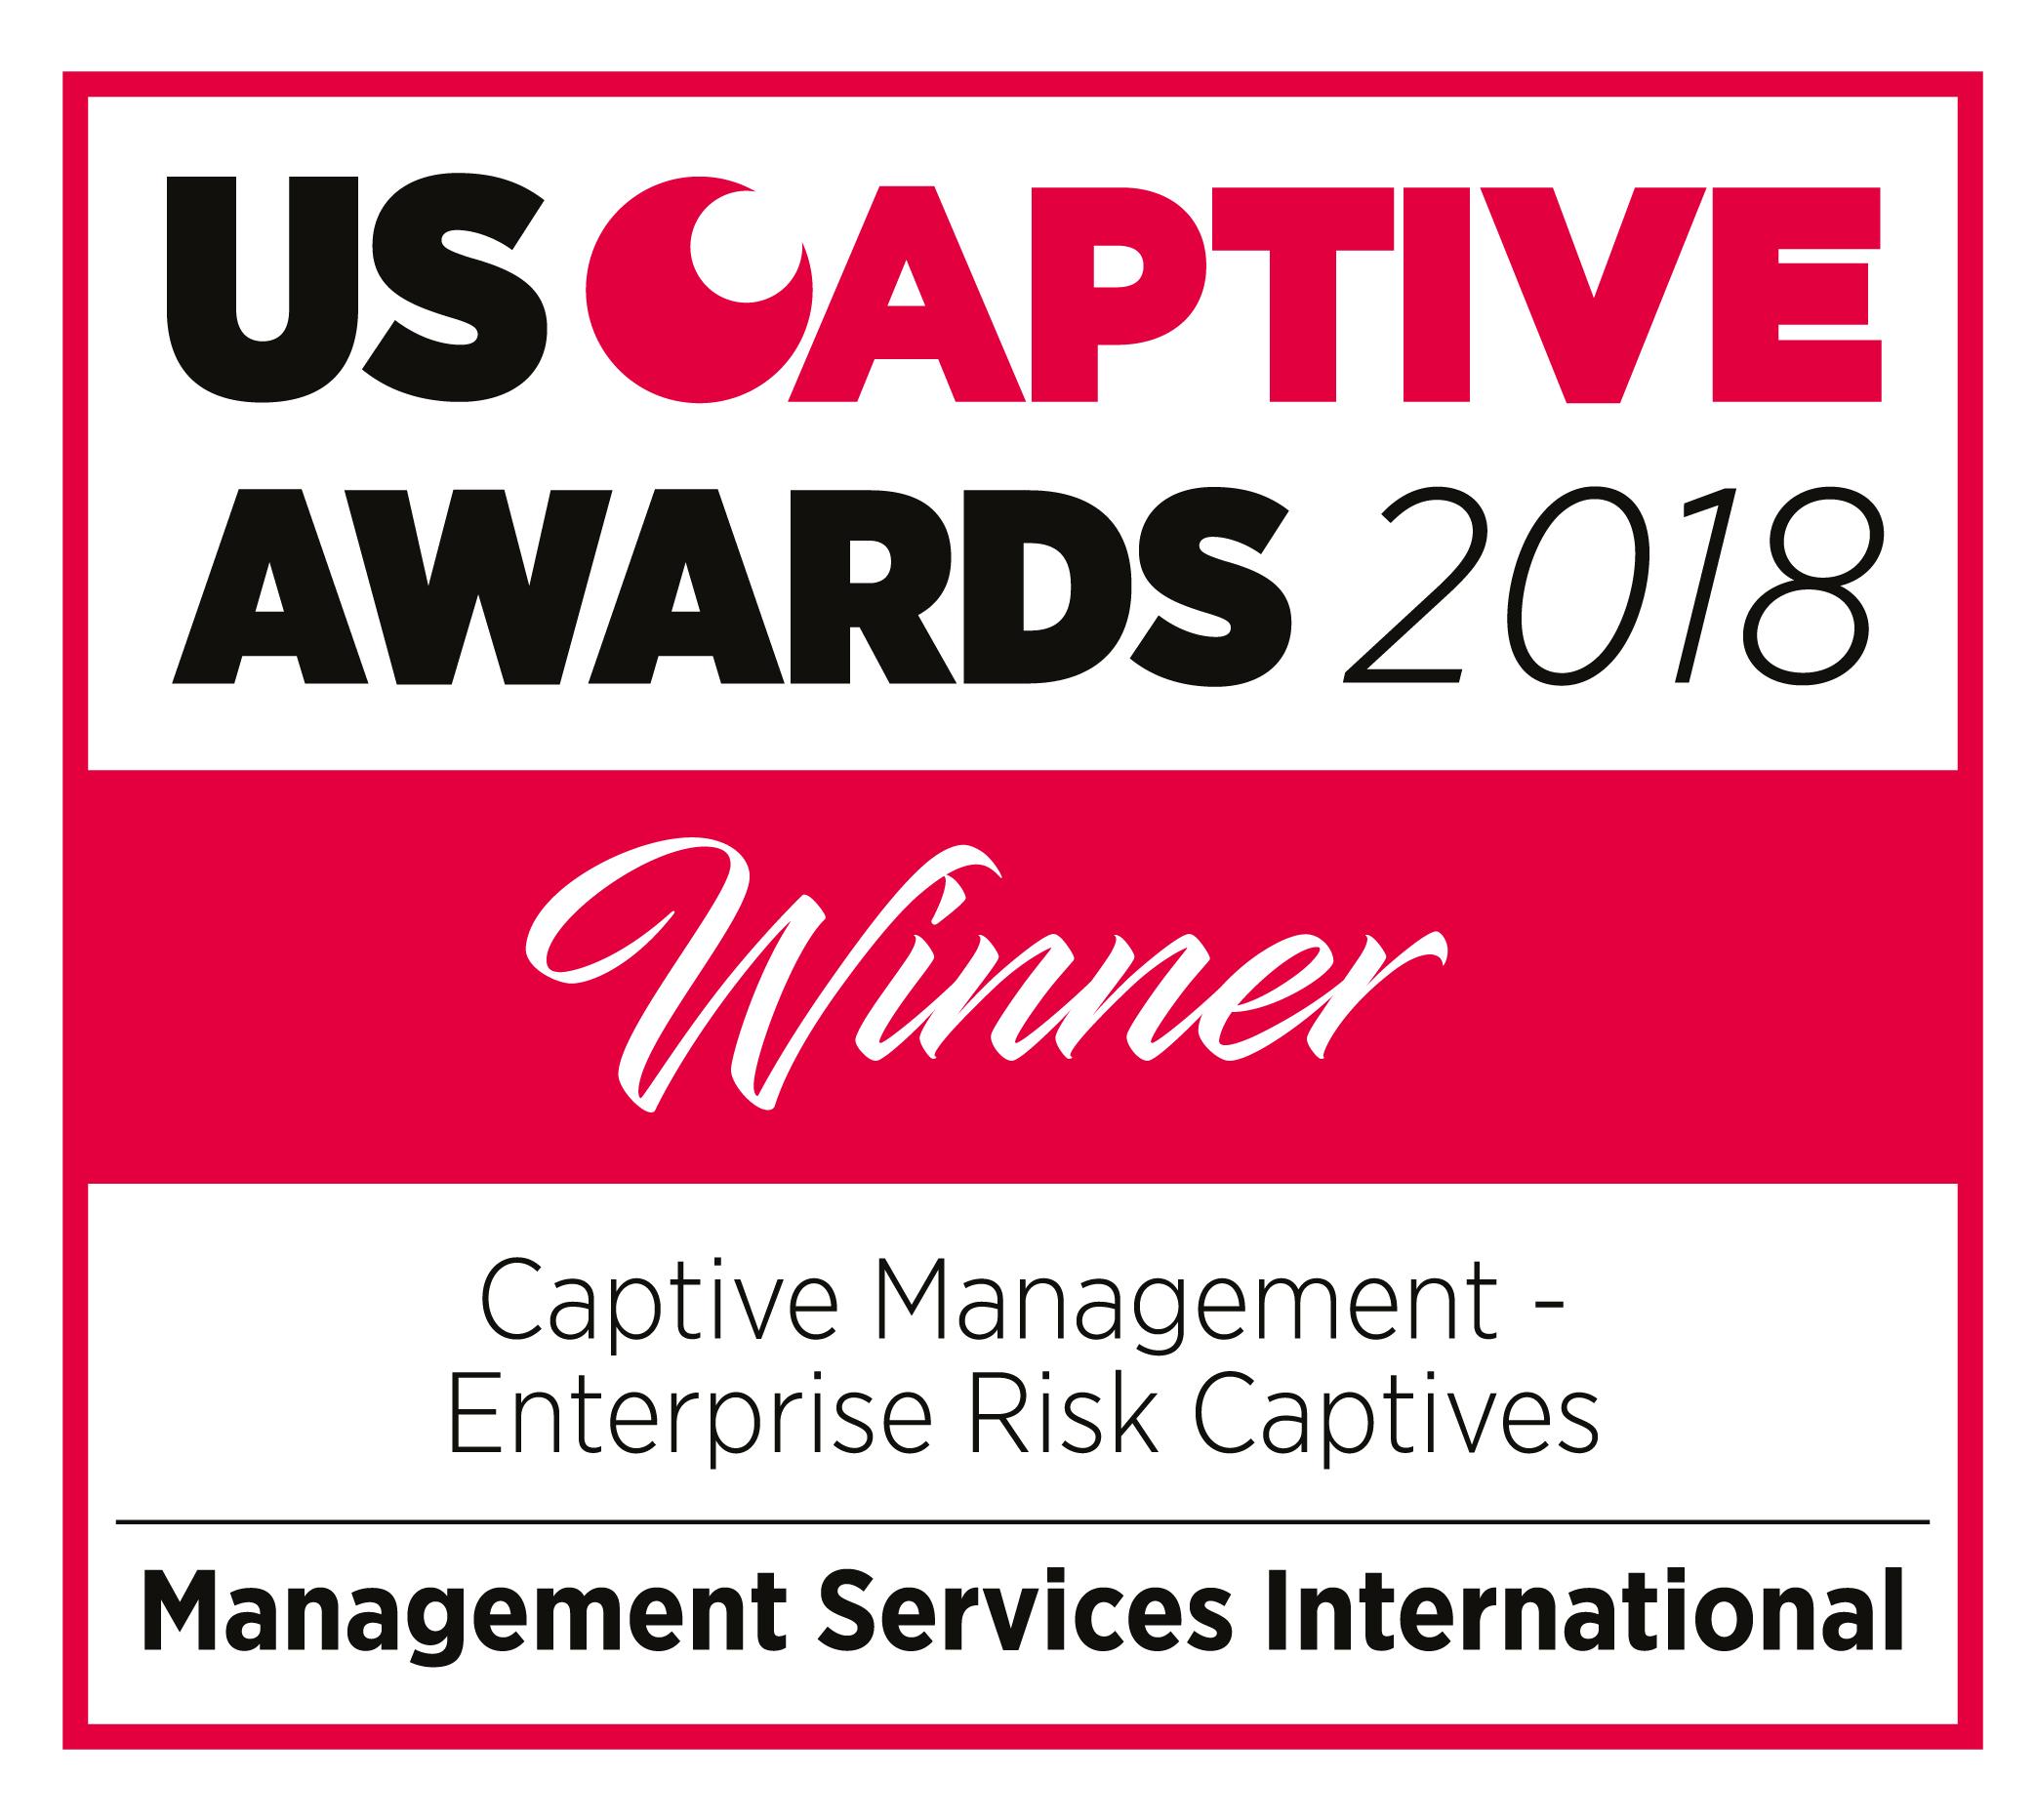 US Captive Awards 2018_WINNER LOGO_CUSTOM_Enterprise Risk Captives_Artboard 1 copy.png